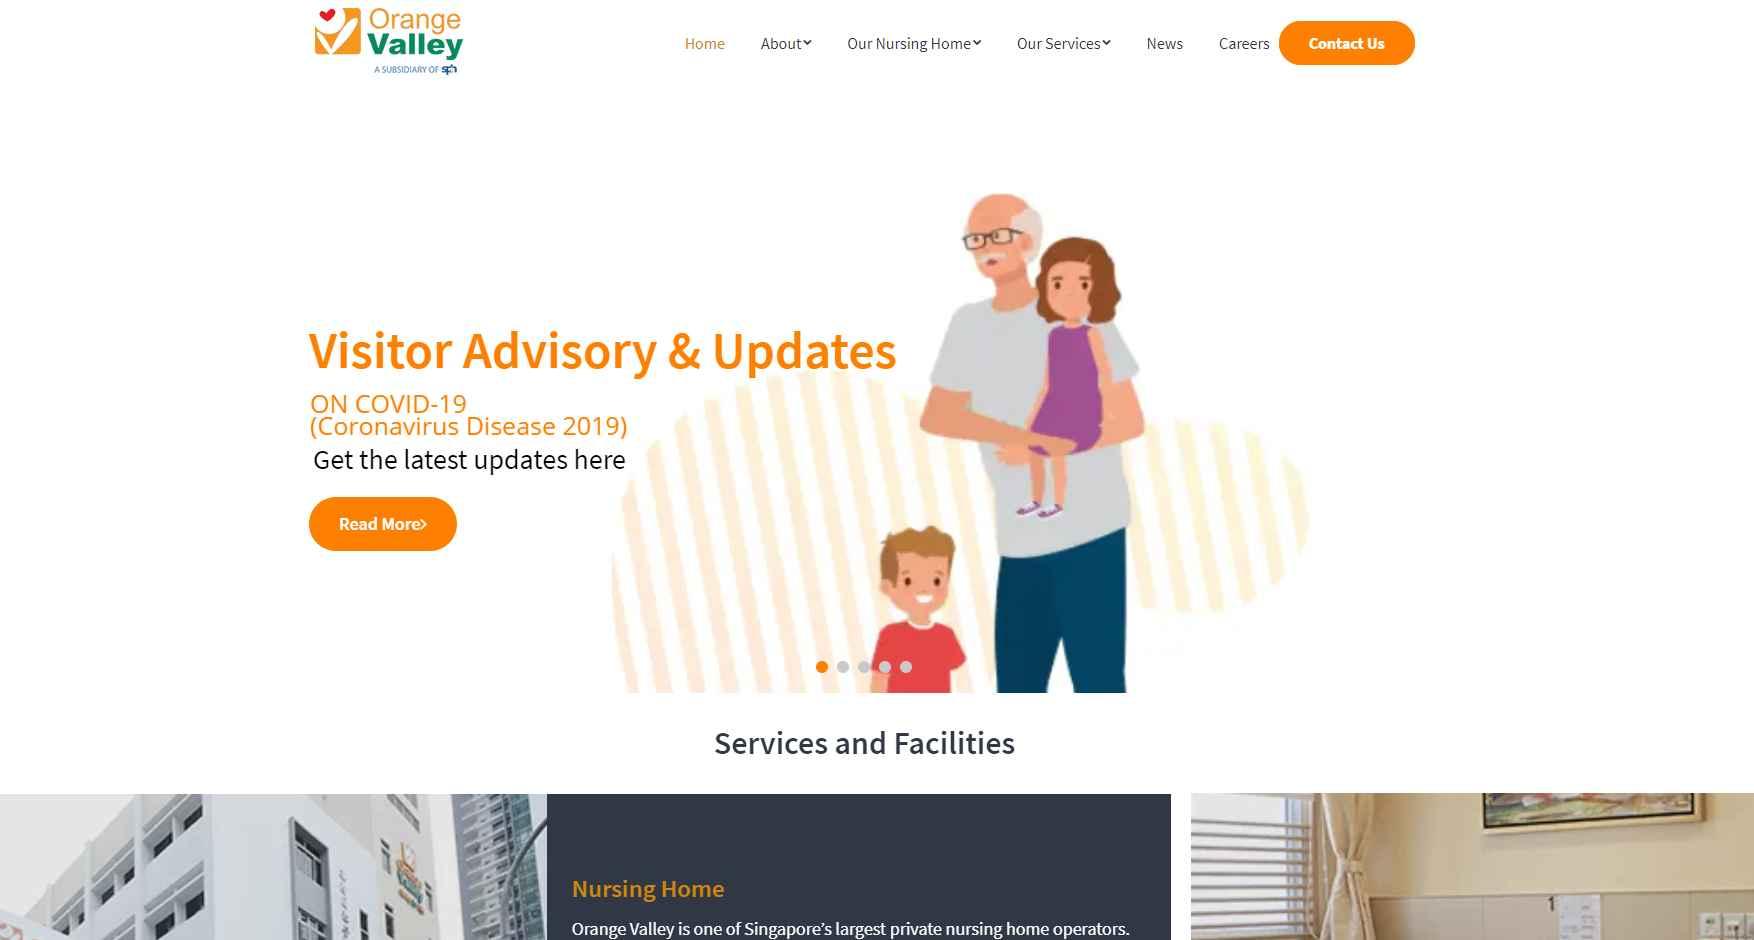 Orange Valley Top Nursing Homes in Singapore